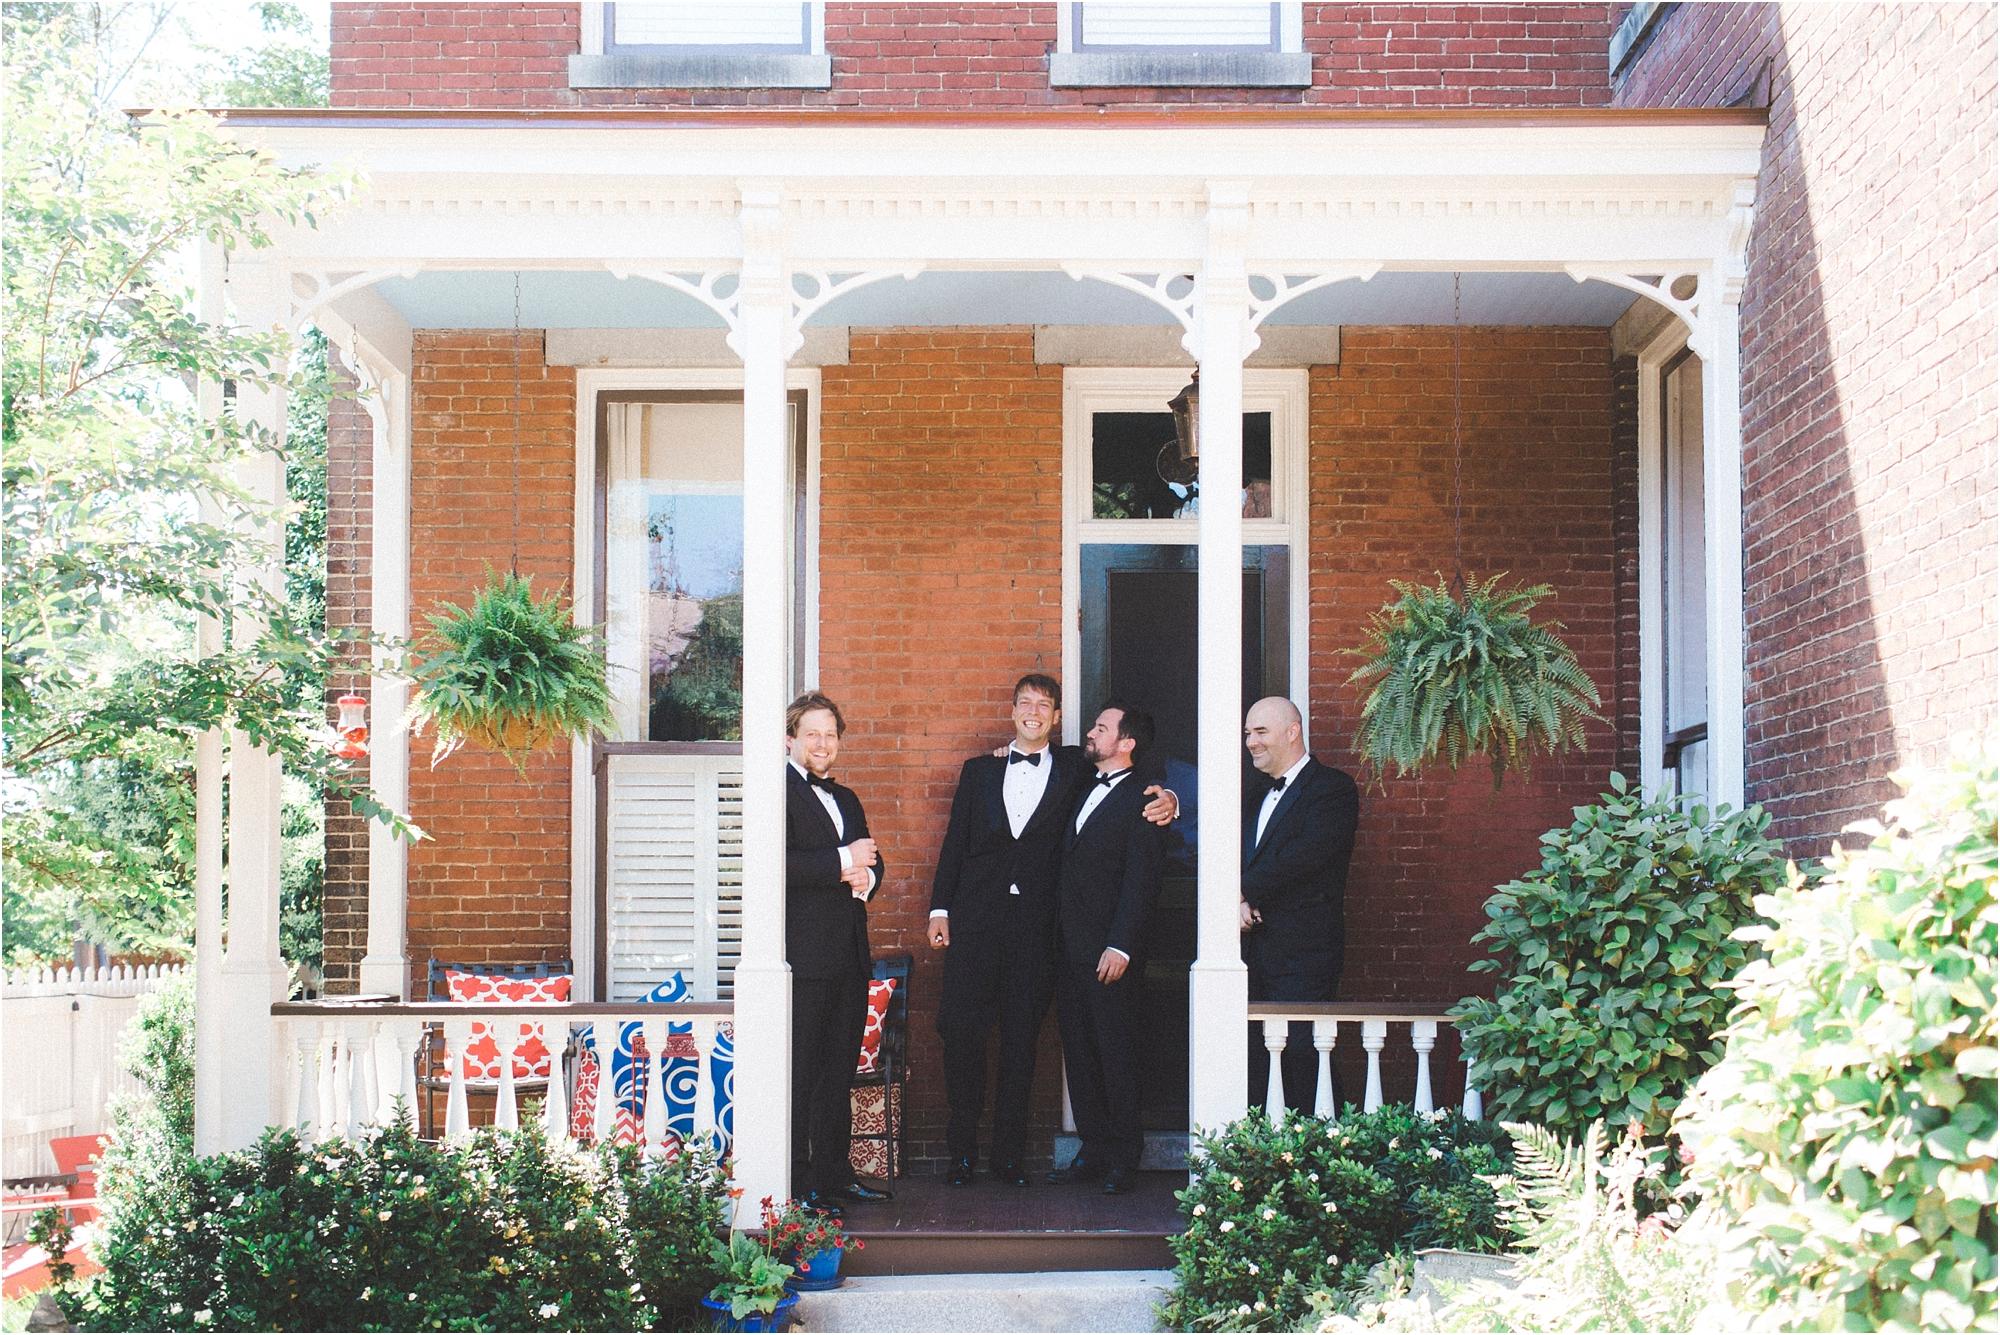 historic-commonwealth-club-richmond-virginia-wedding-photos_0014.jpg